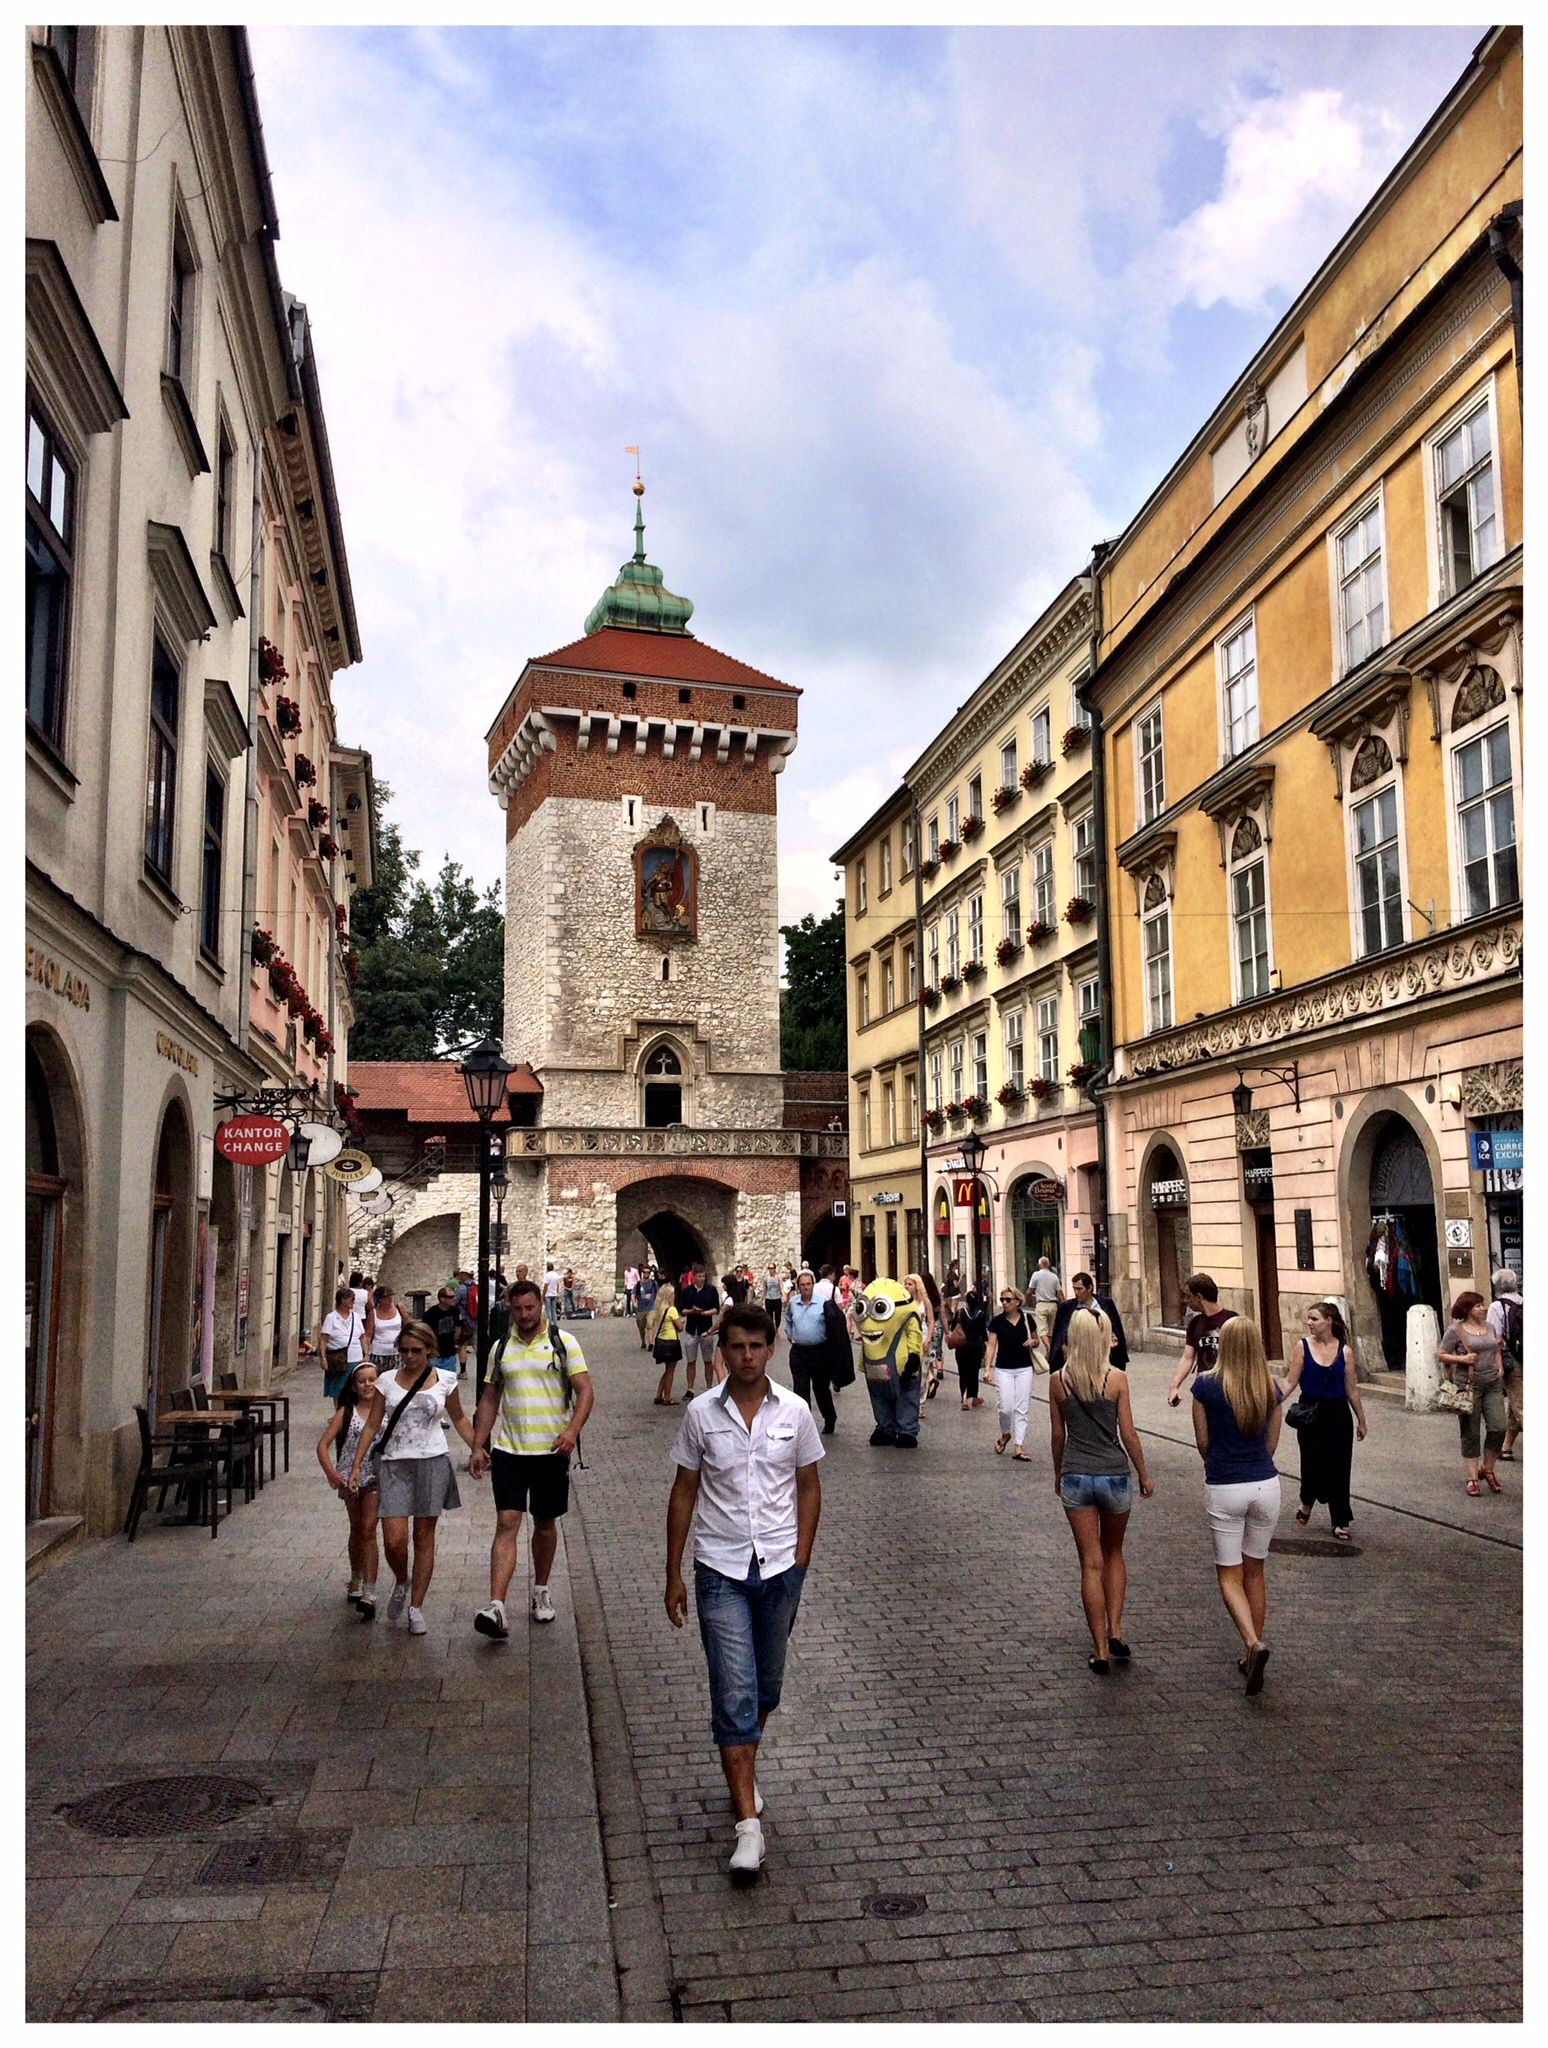 Main street in Krakow, Poland